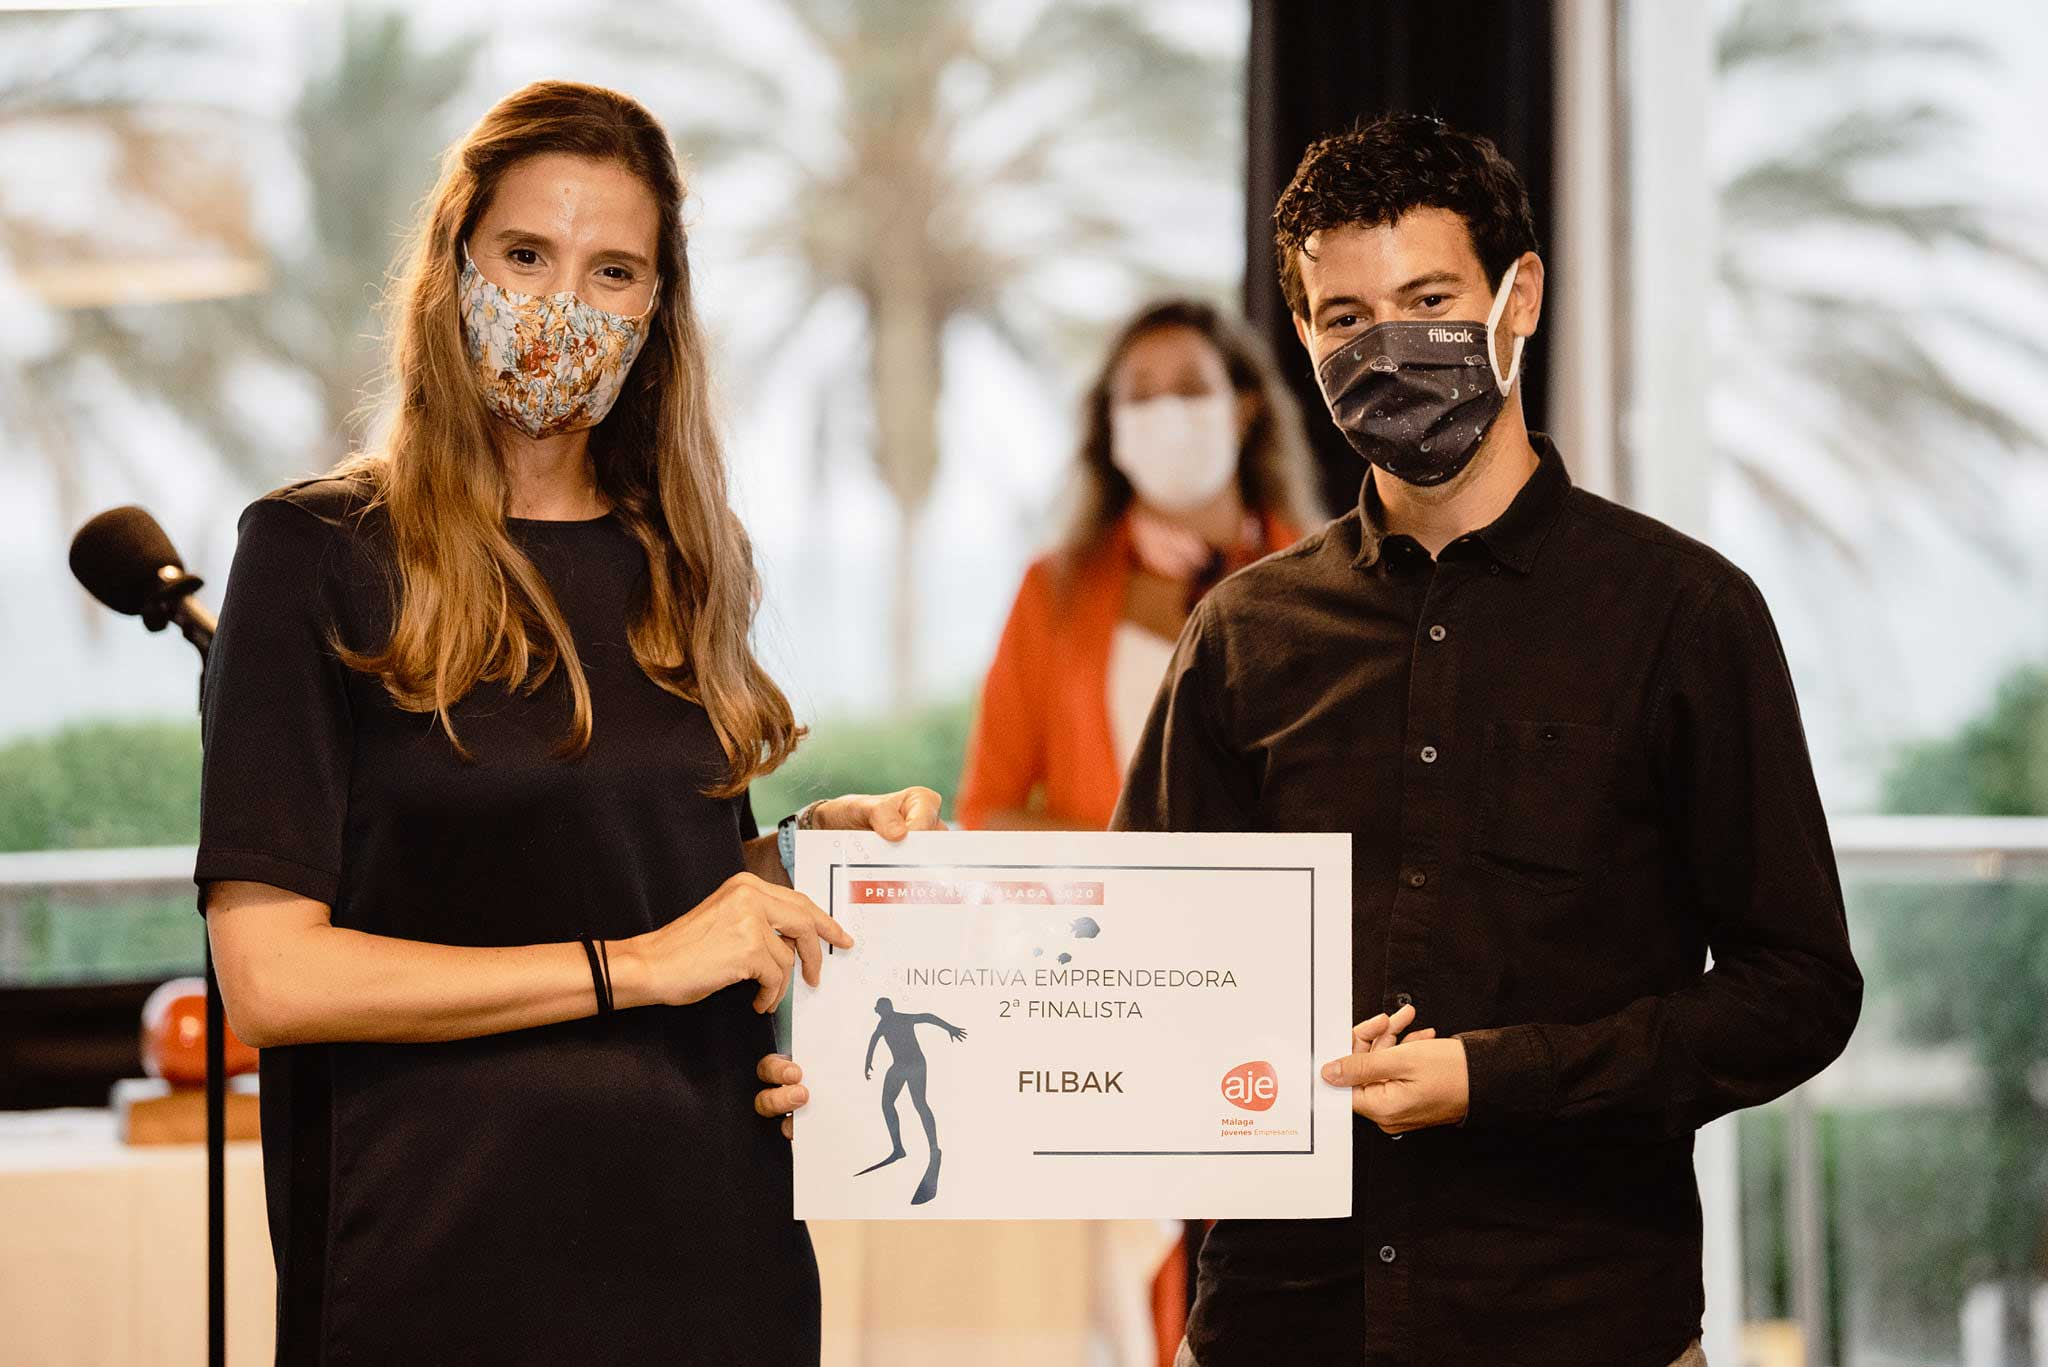 Filbak galardonada en los premios aje 2020